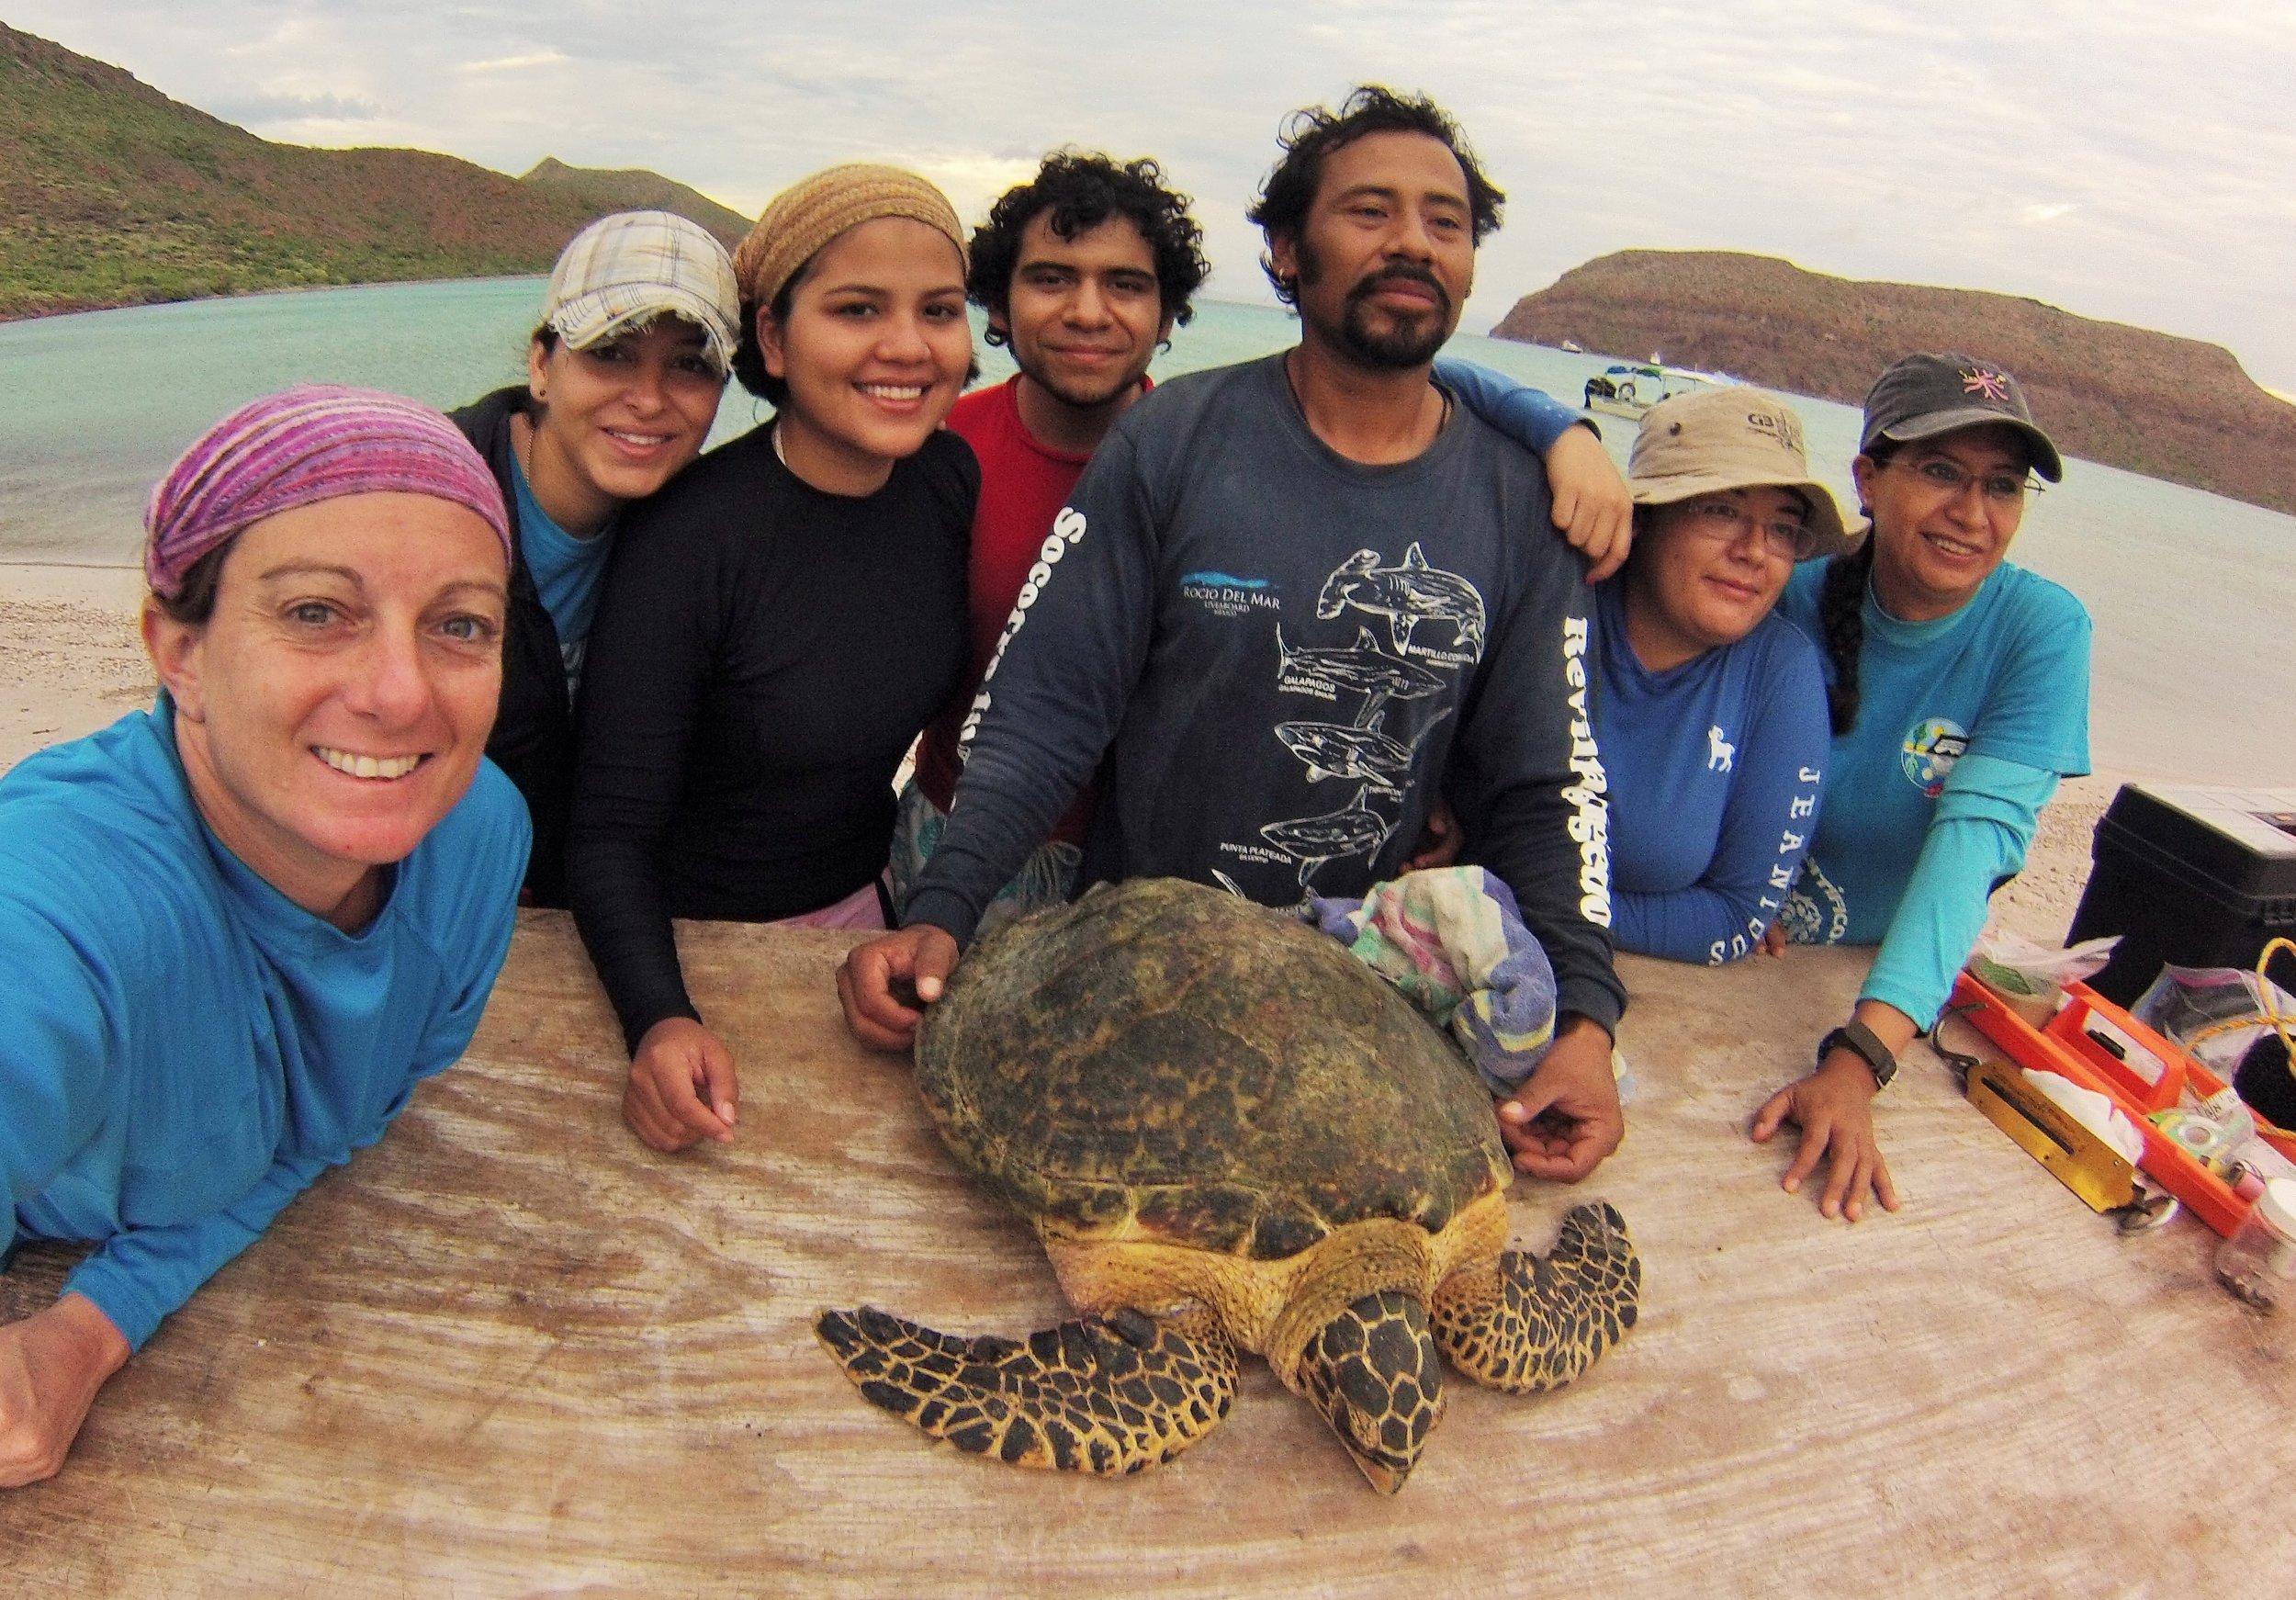 SWOT grantees with a hawksbill turtle in Baja California, Mexico. © ProFauna Baja